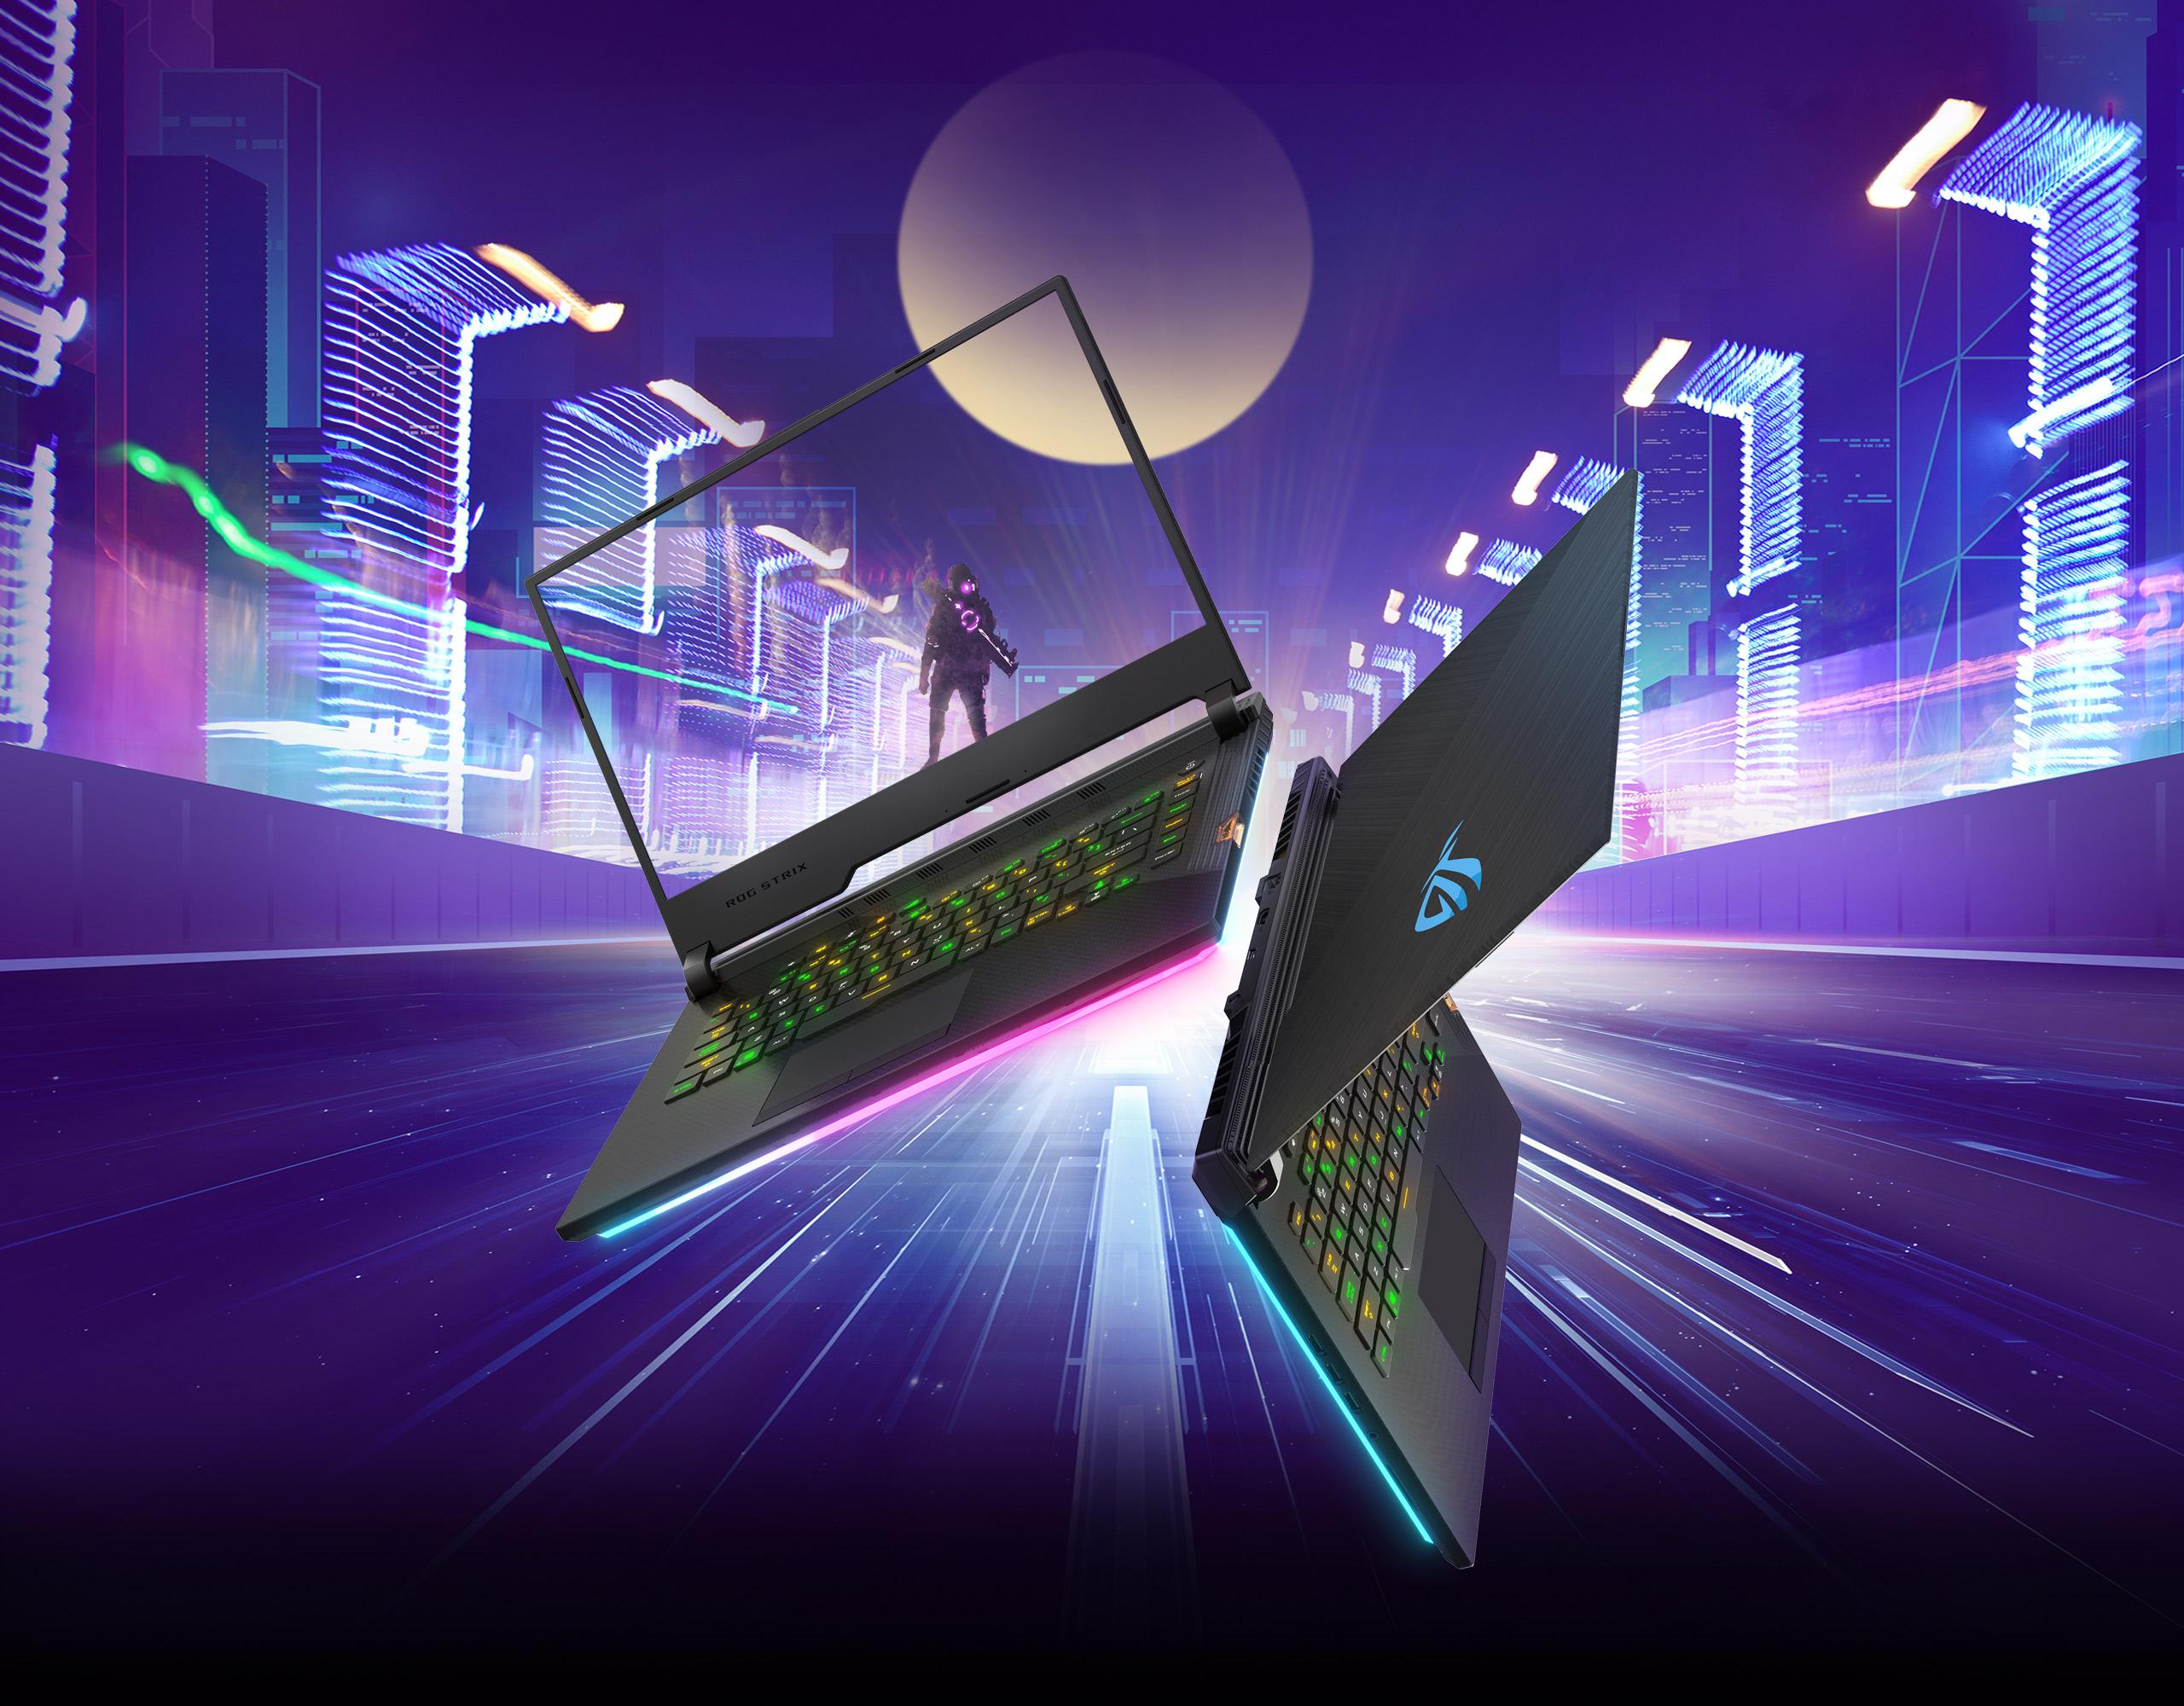 ROG Strix SCAR III | ROG - Republic Of Gamers | ASUS